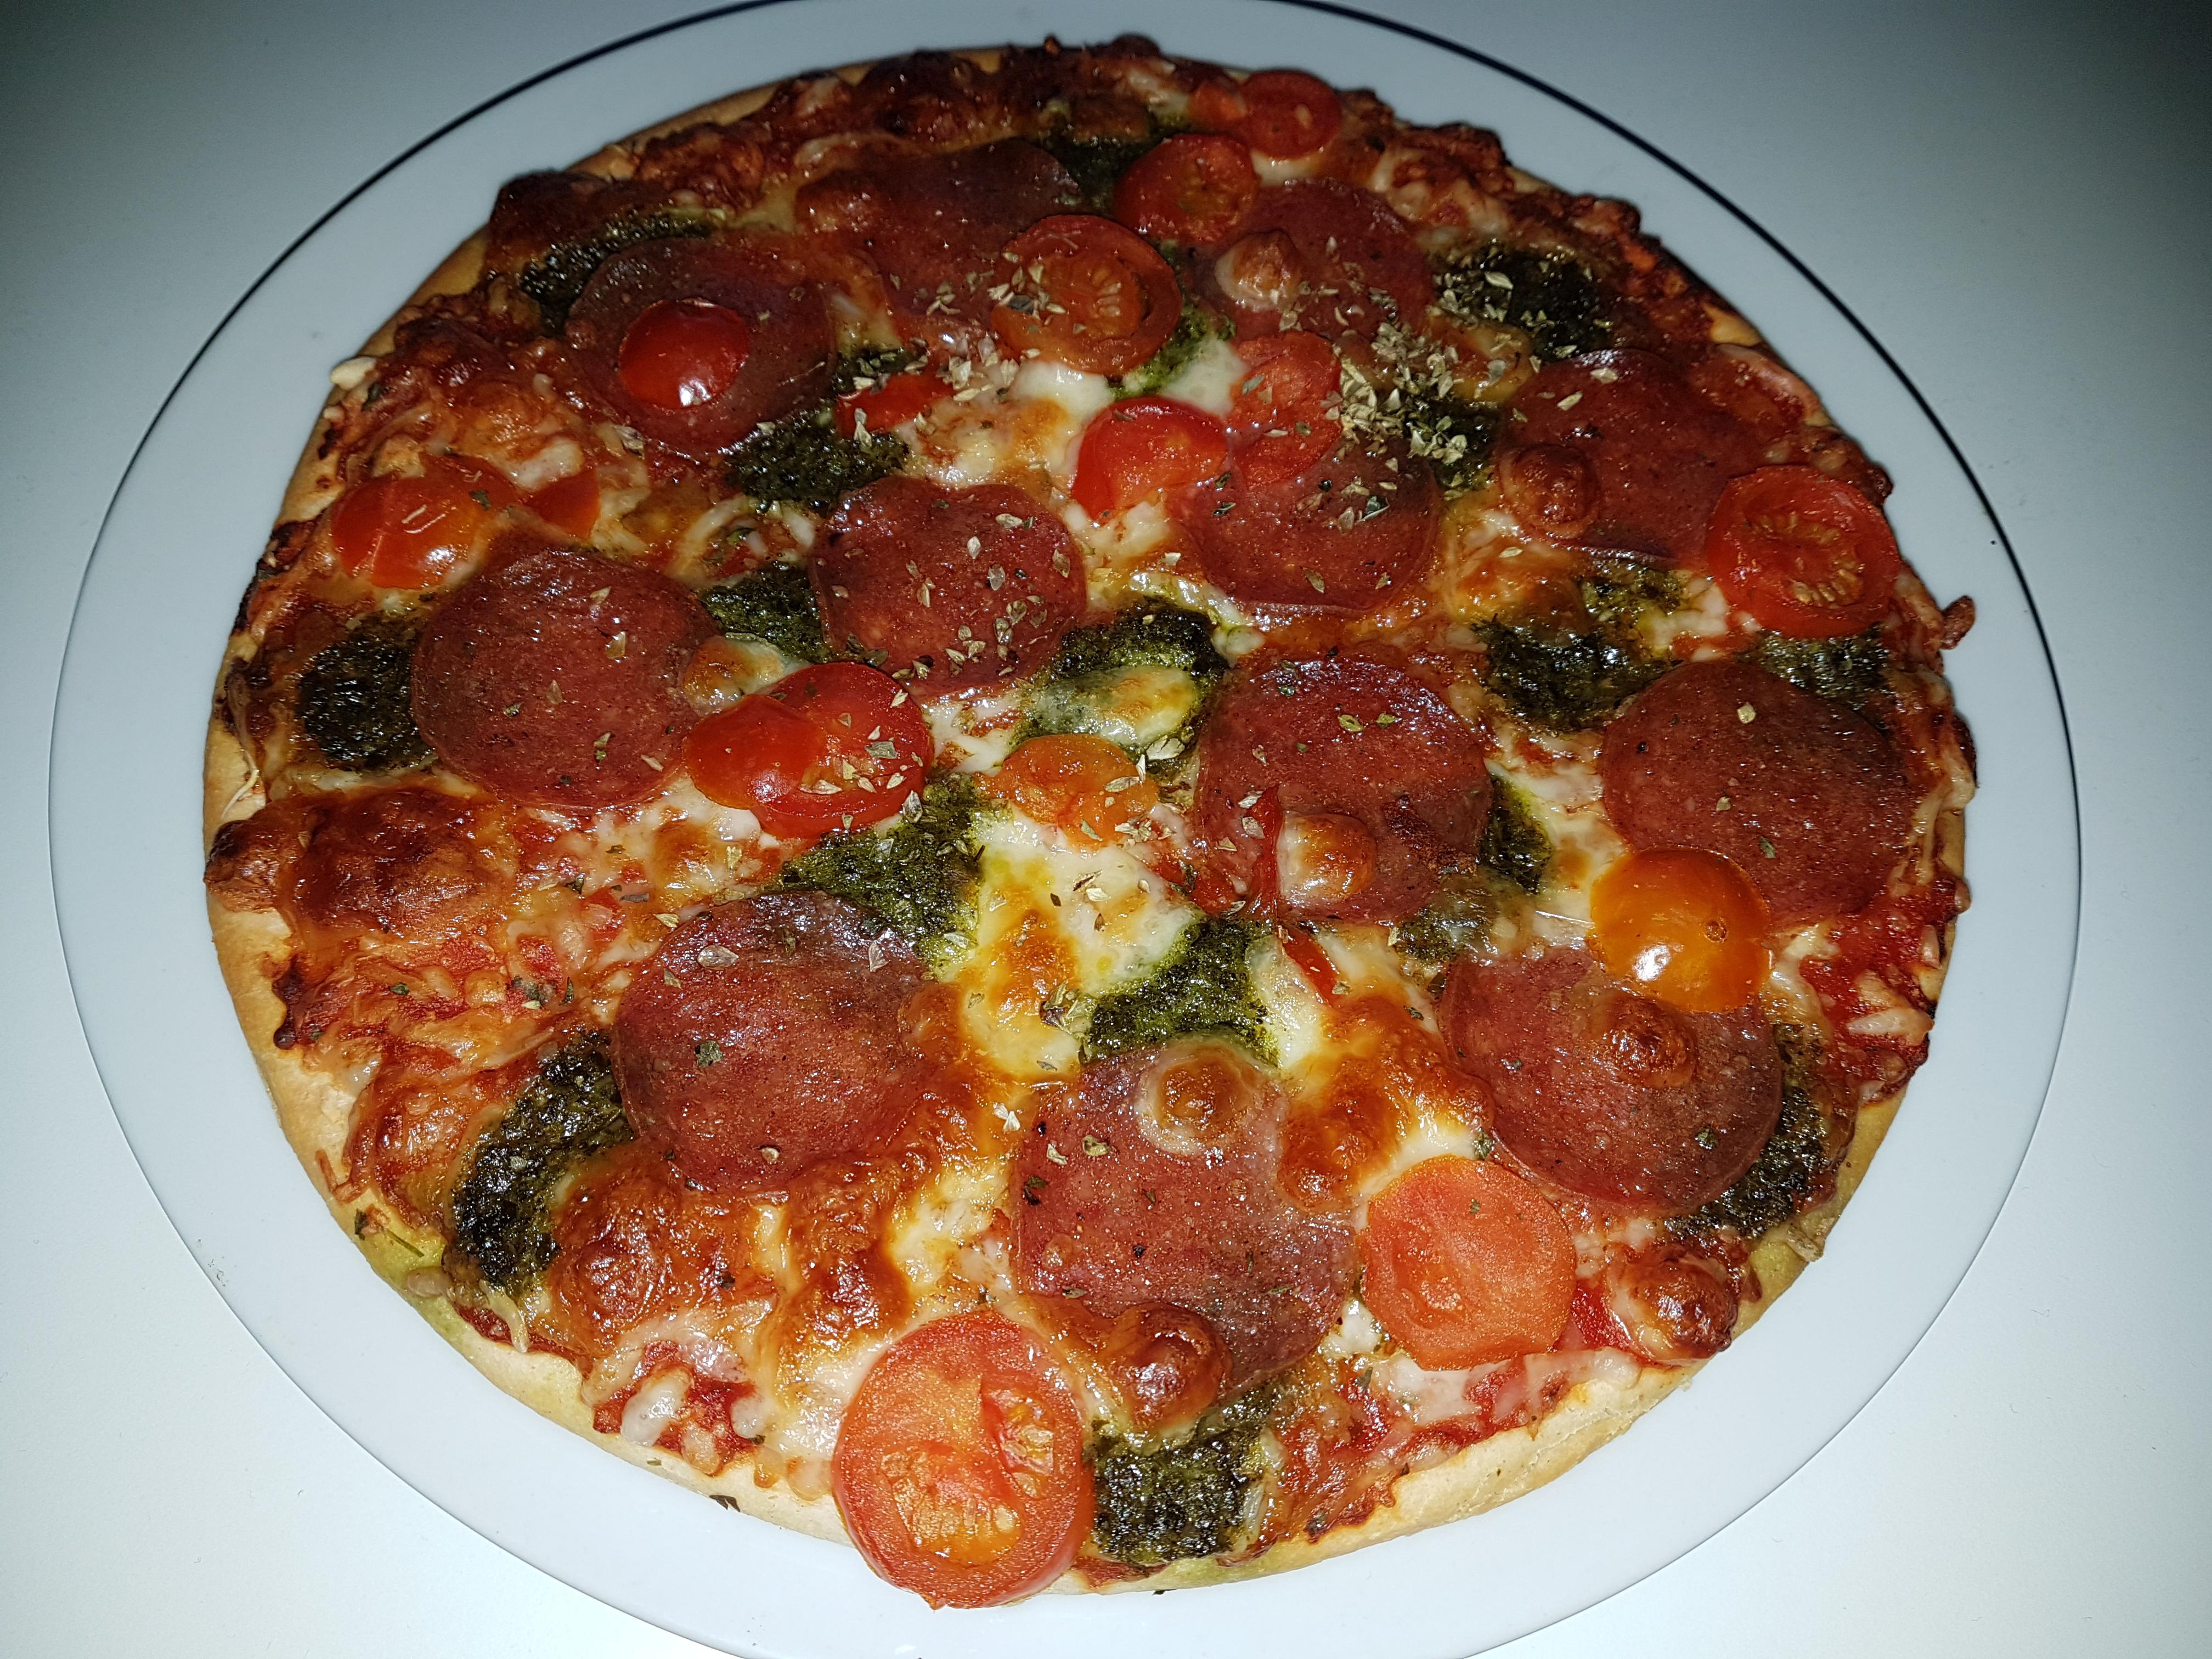 http://foodloader.net/Holz_2018-02-13_Pizza.jpg